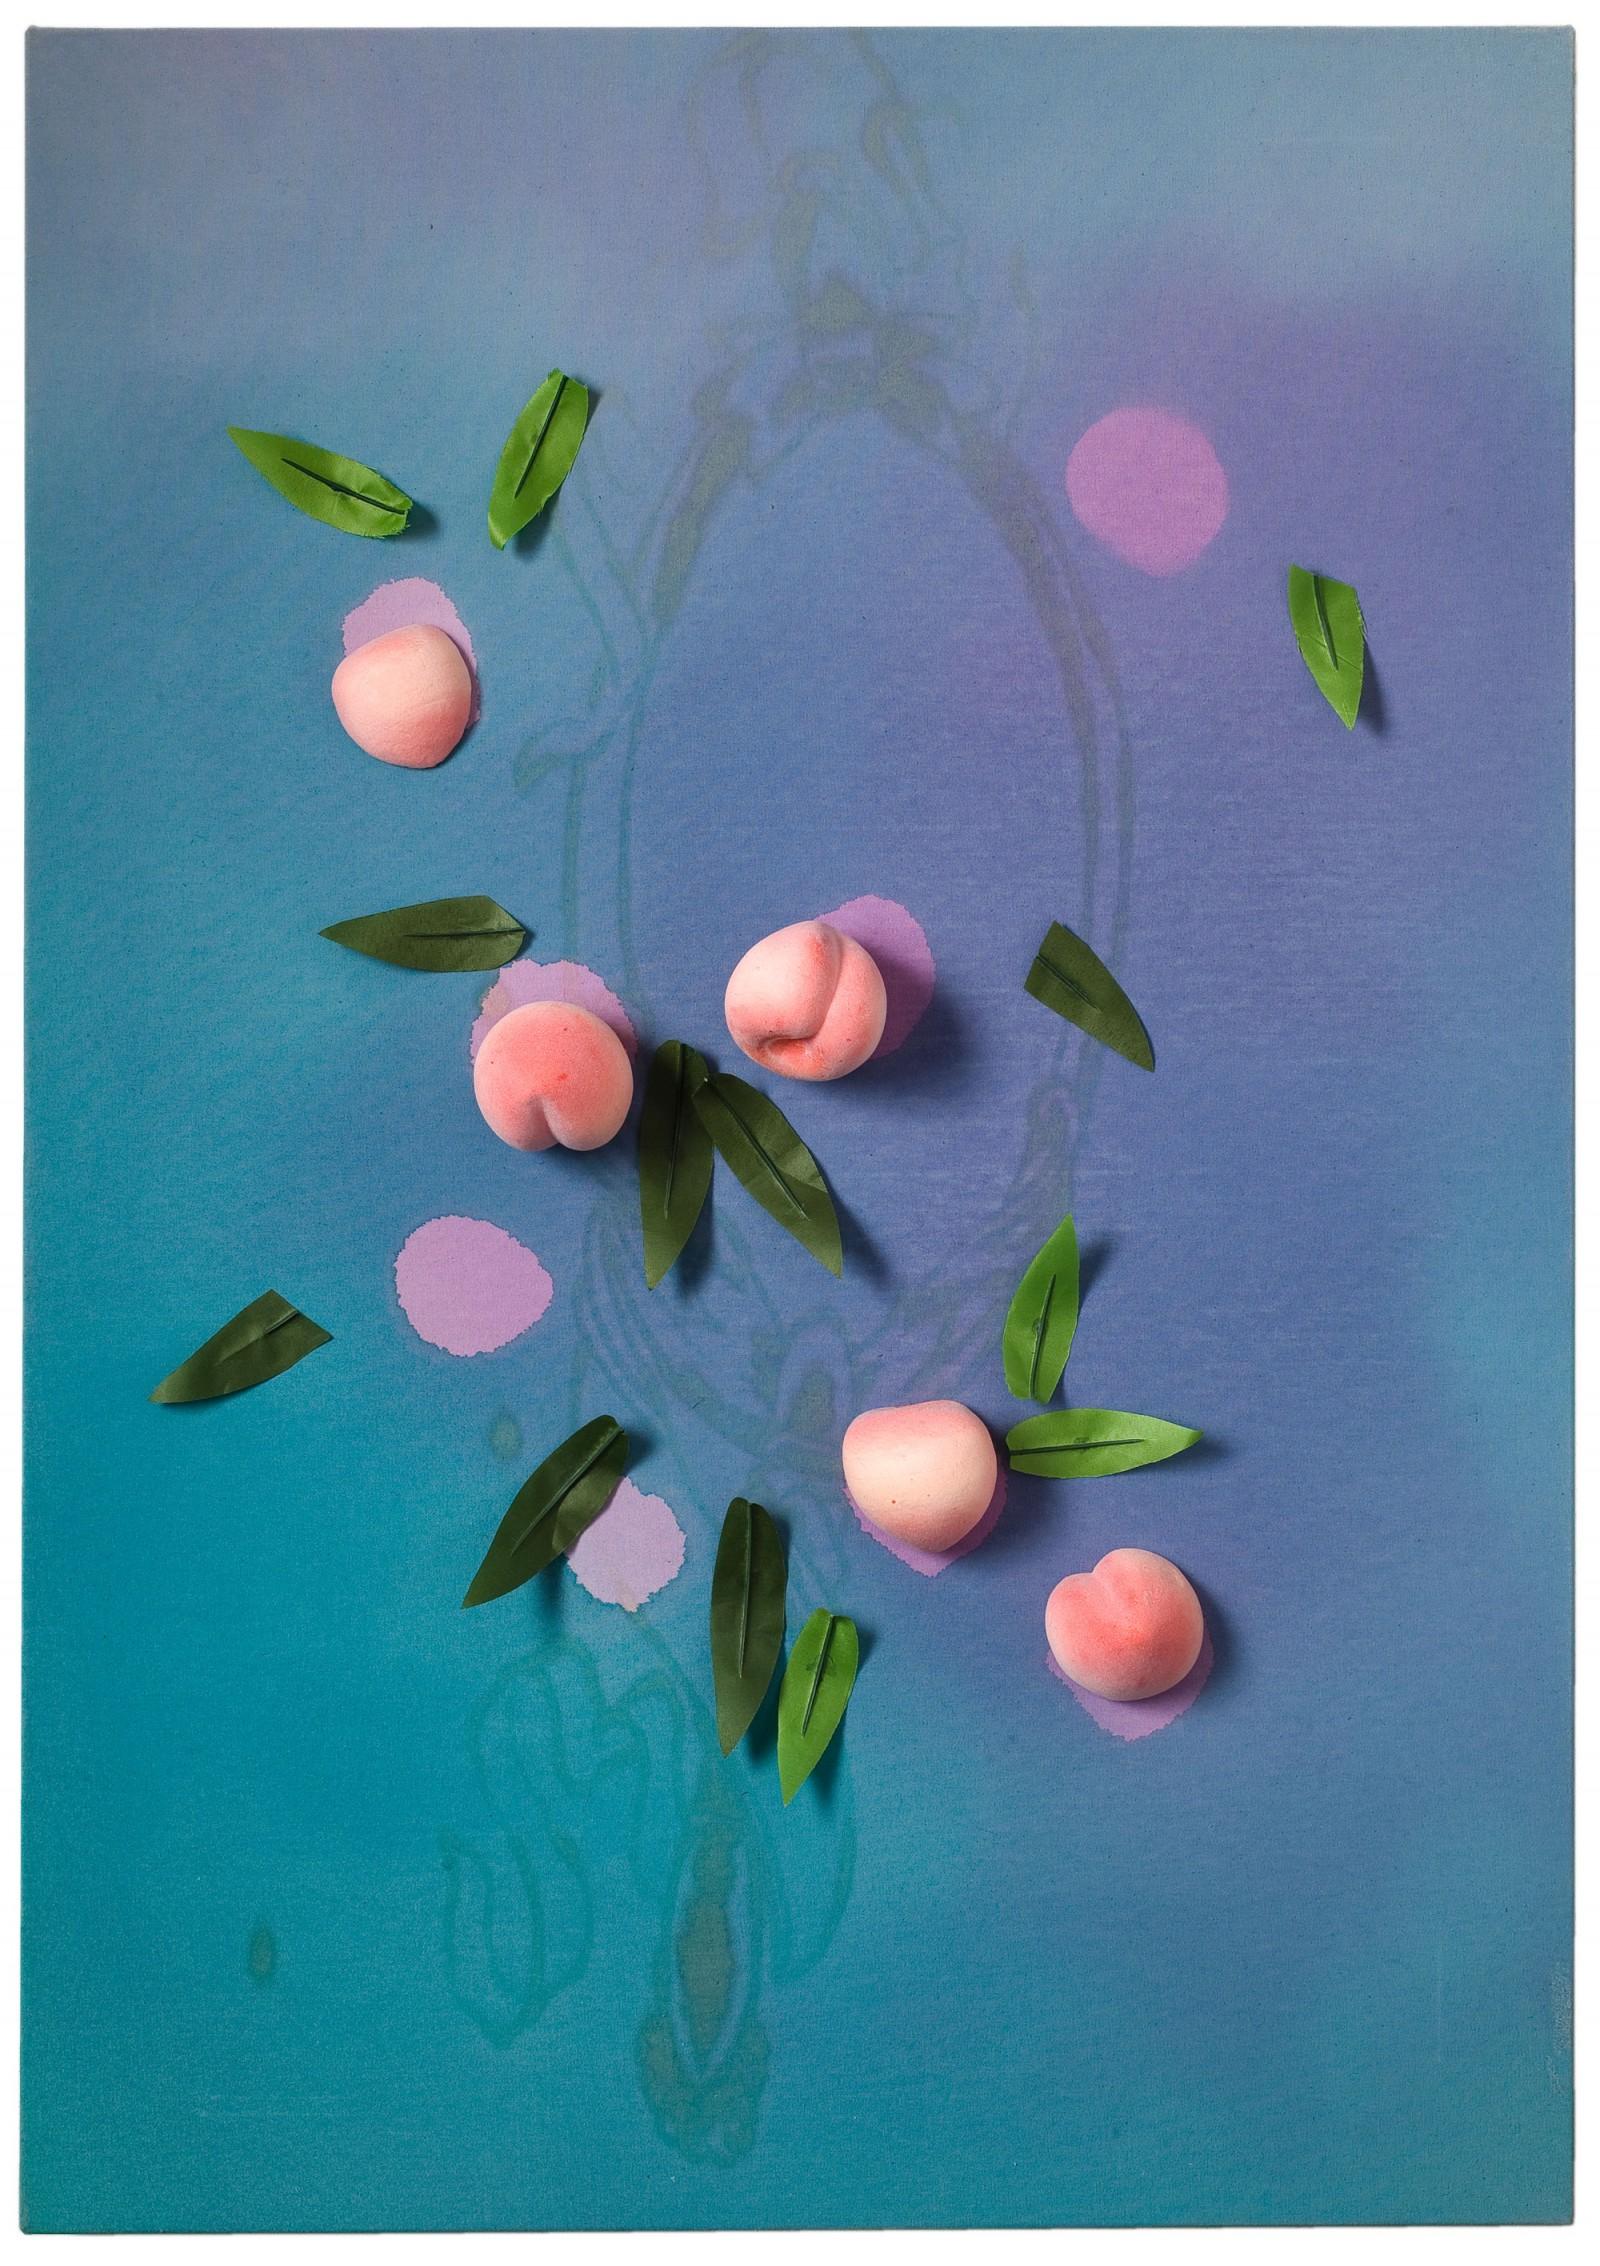 Kim Nekarda: Untitled, vinyl color, poppy oil & peaches on cotton, 100 x 70 cm, private collection, saarbruecken